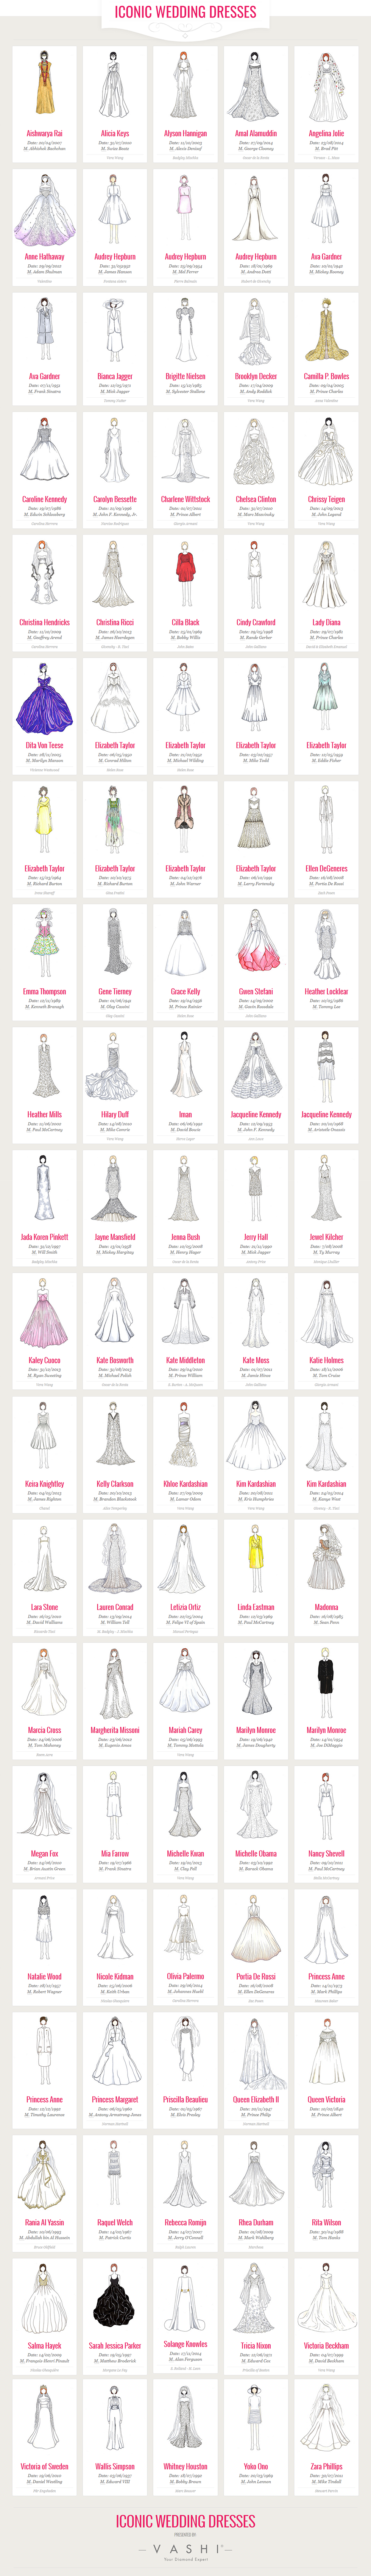 100 bridal